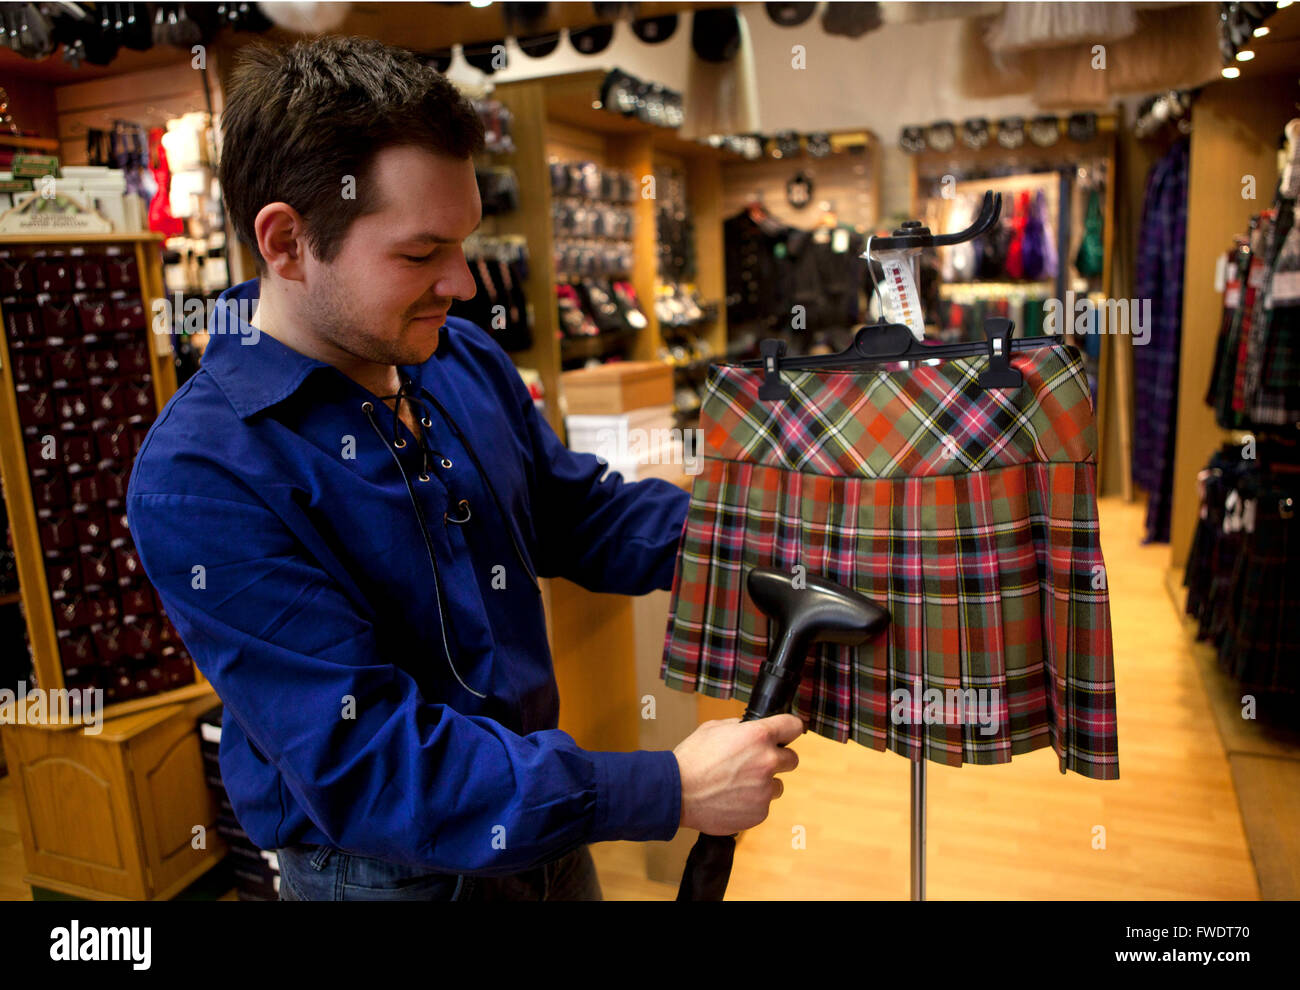 EdinburghScotland Man Steam Ironing A Tartan Mini Skirt